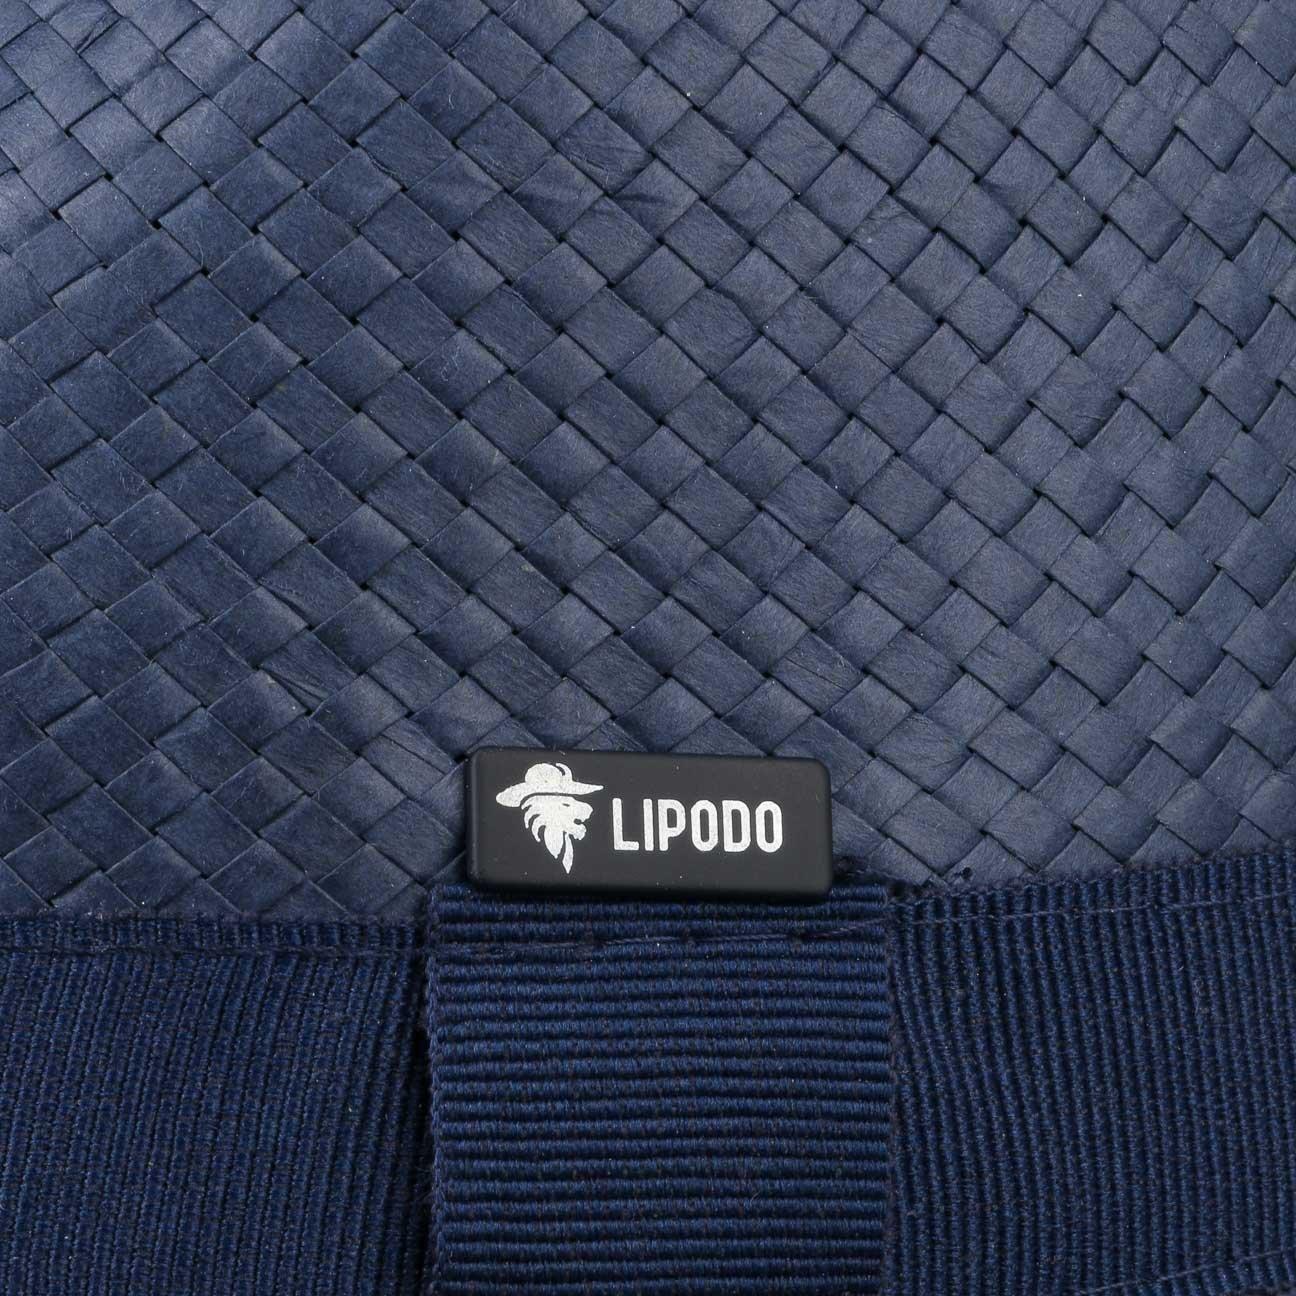 baffbd0ea7c86 Lipodo Colour City Trilby Straw Hat Women/Men | Hat Made of 100% Straw |  Straw Trilby Made in Italy | Sun Hat in S-L | Blue Fedora with Grosgrain  Ribbon: ...